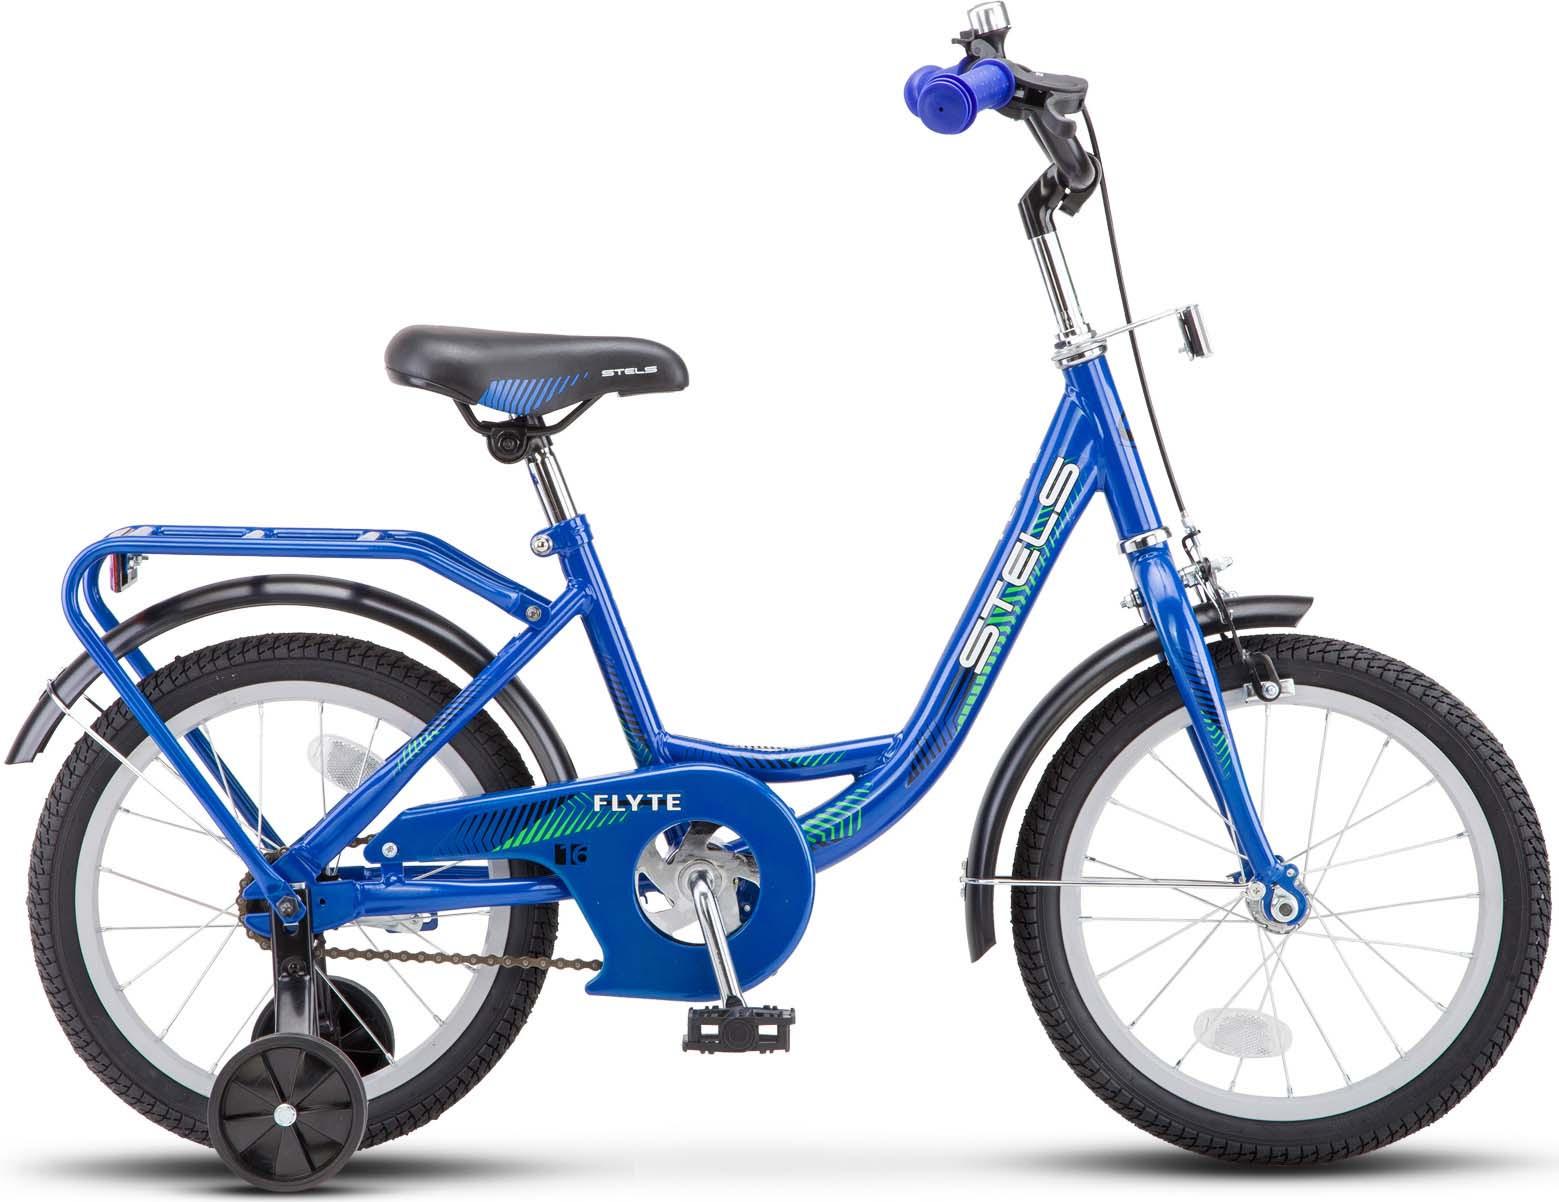 Велосипед Stels Flyte 12, JU000177372018, синий недорго, оригинальная цена